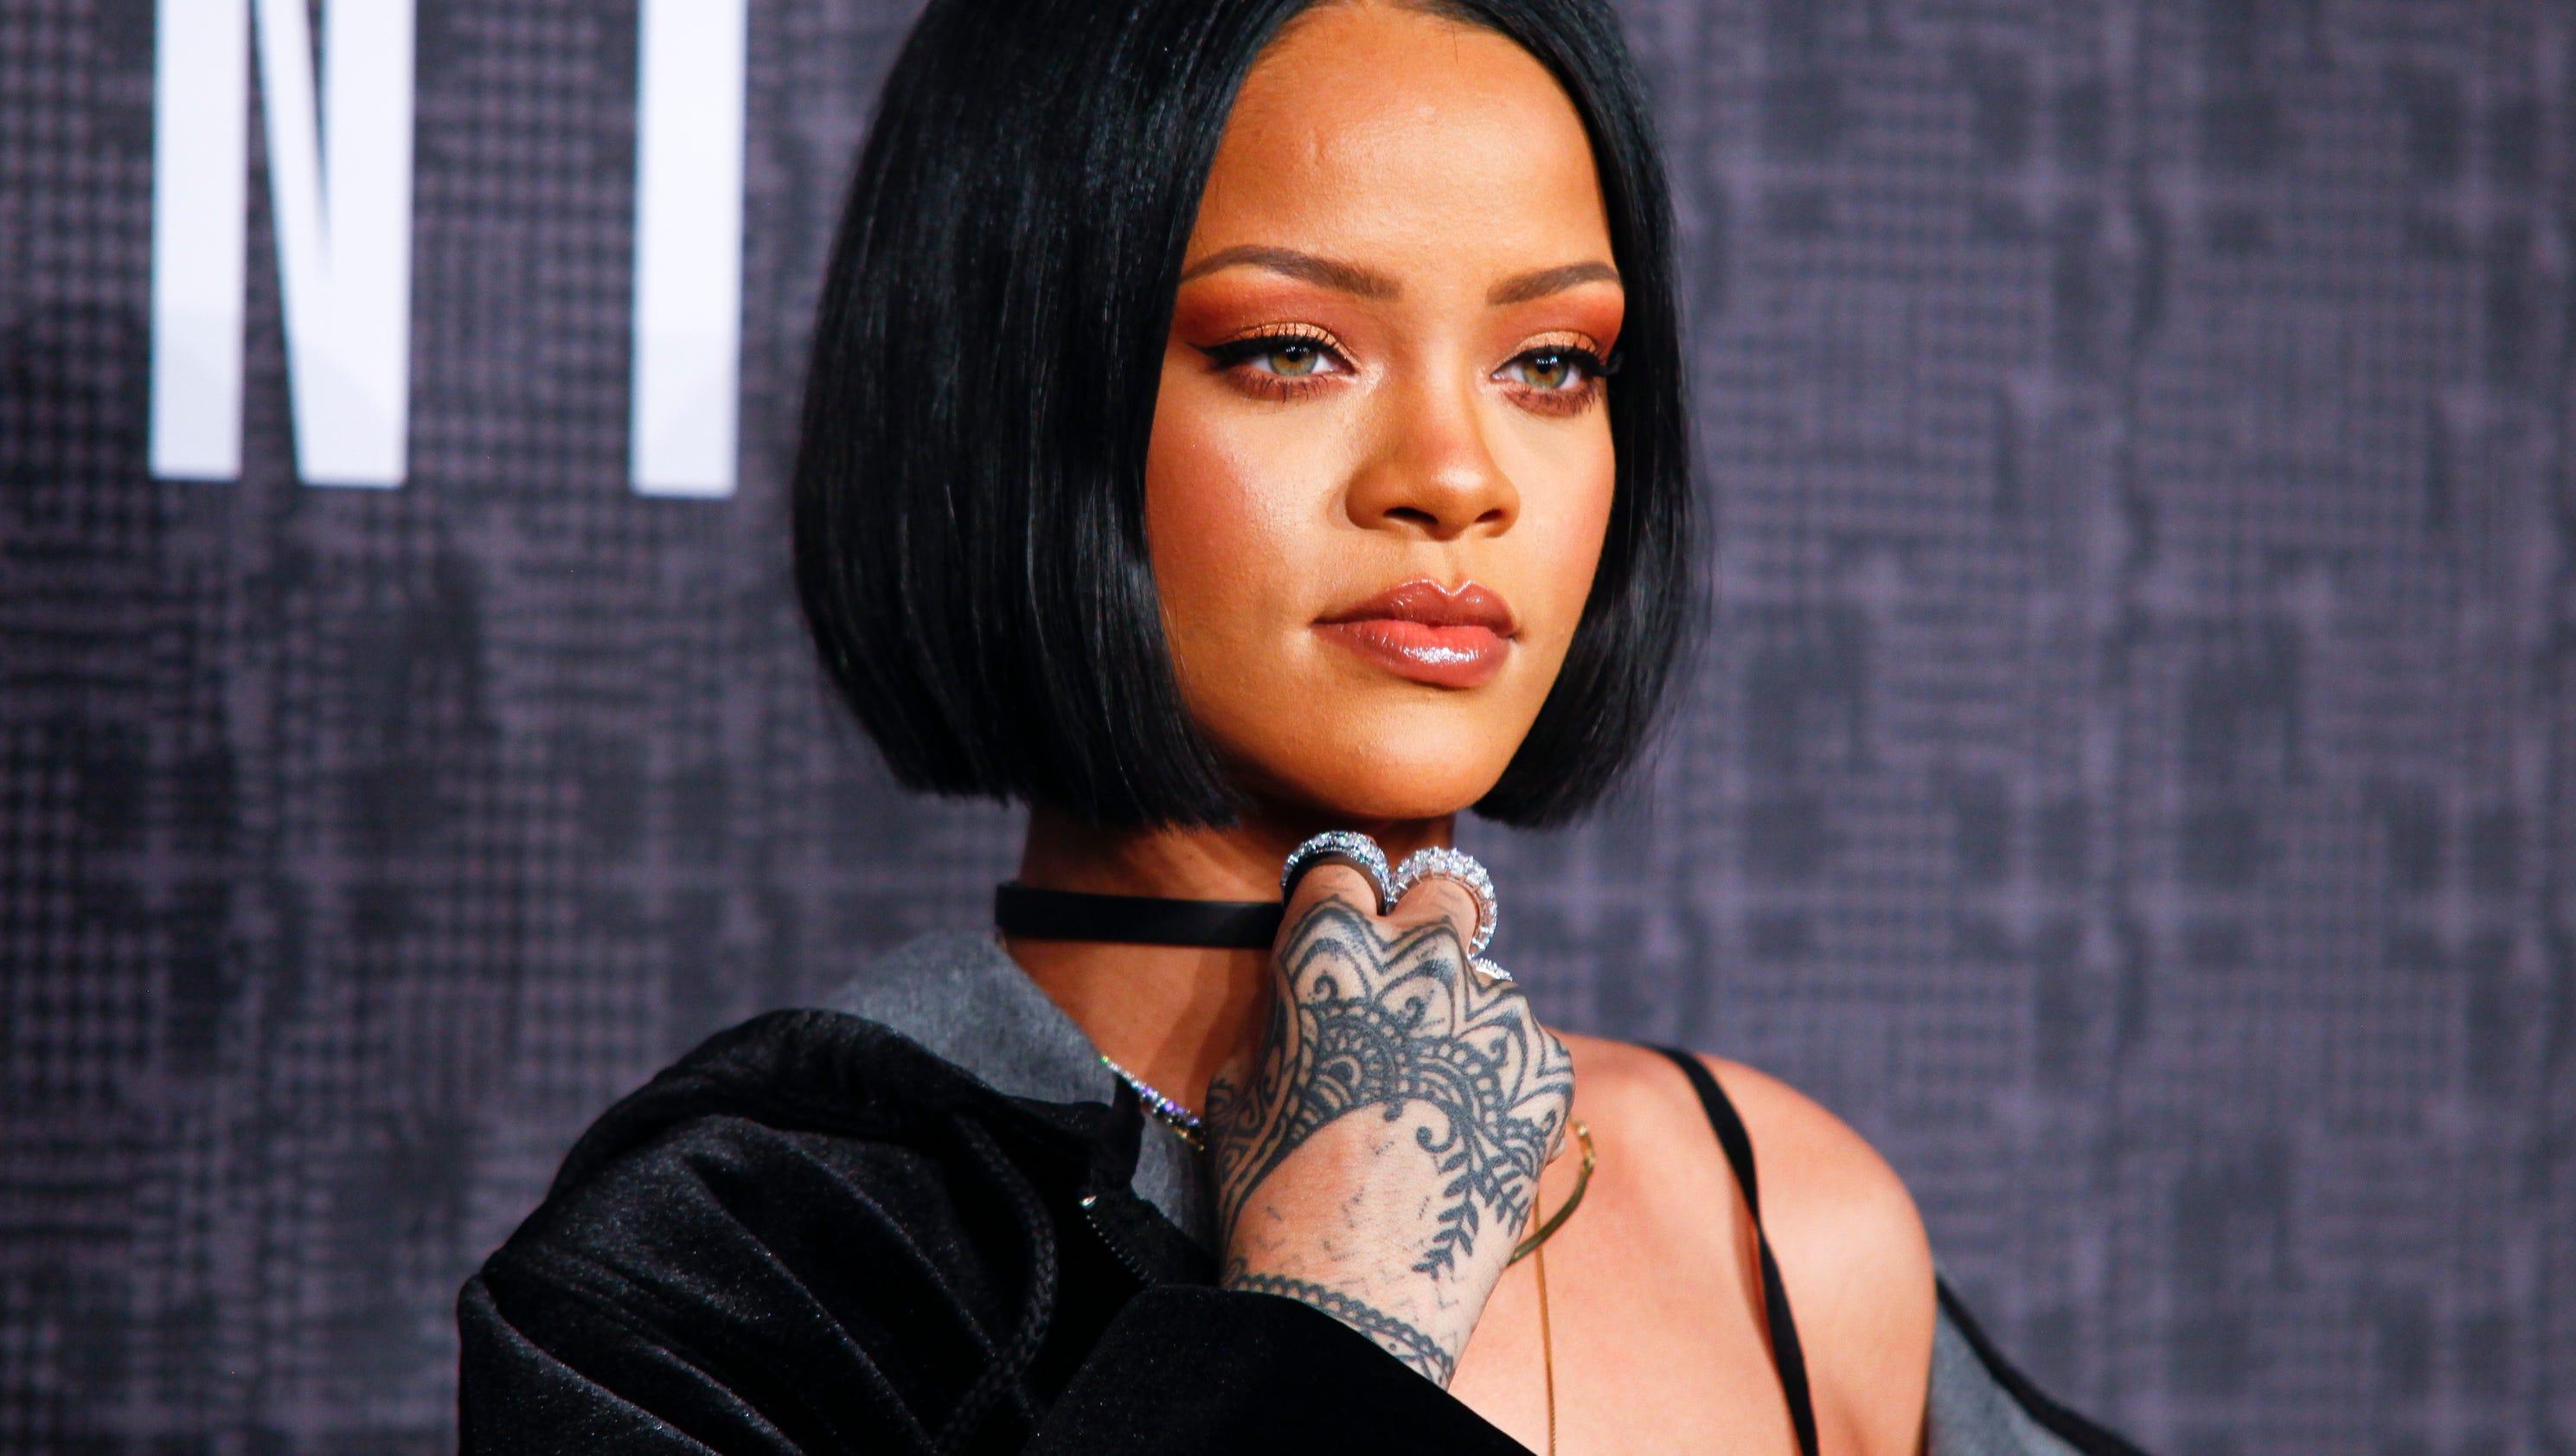 Rihanna drops new song, video 'Sledgehammer'